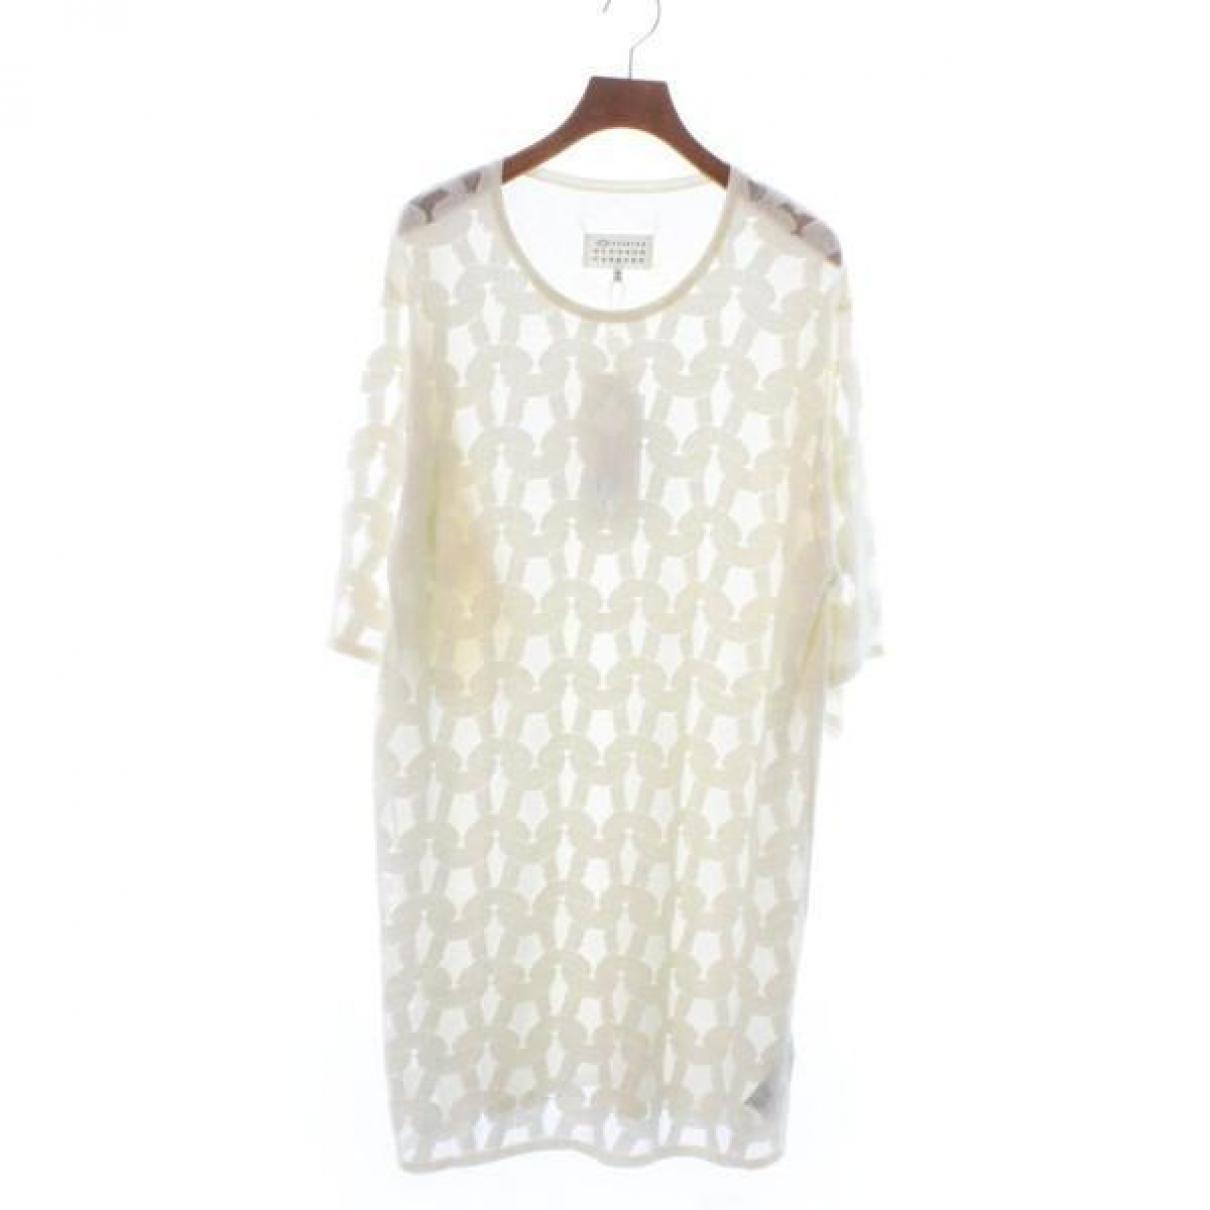 Maison Martin Margiela N White Cotton Knitwear for Women S International